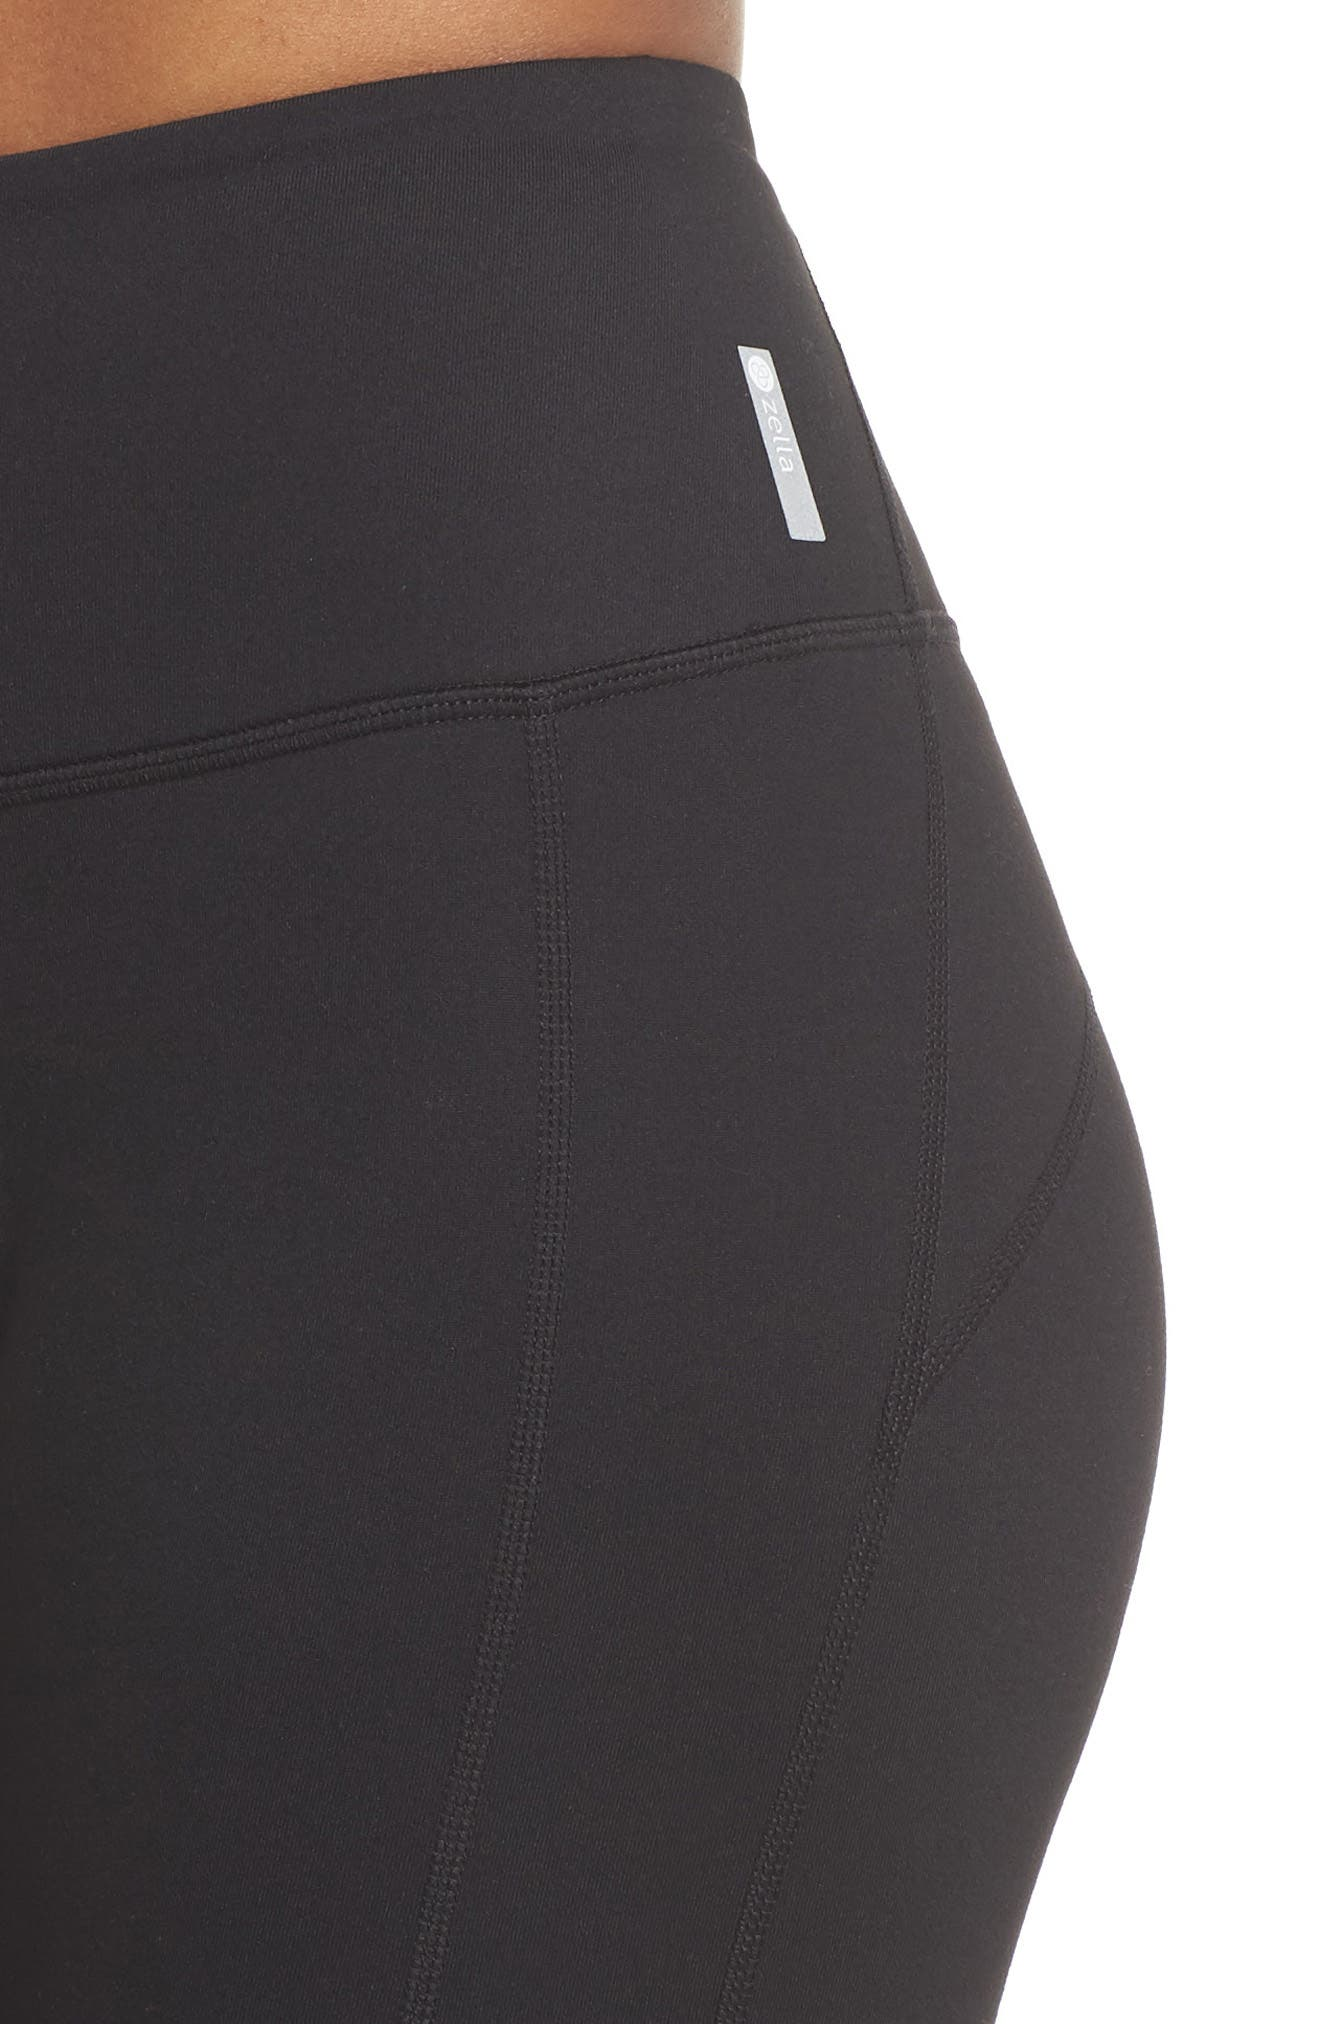 Plank High Waist Midi Leggings,                             Alternate thumbnail 4, color,                             BLACK